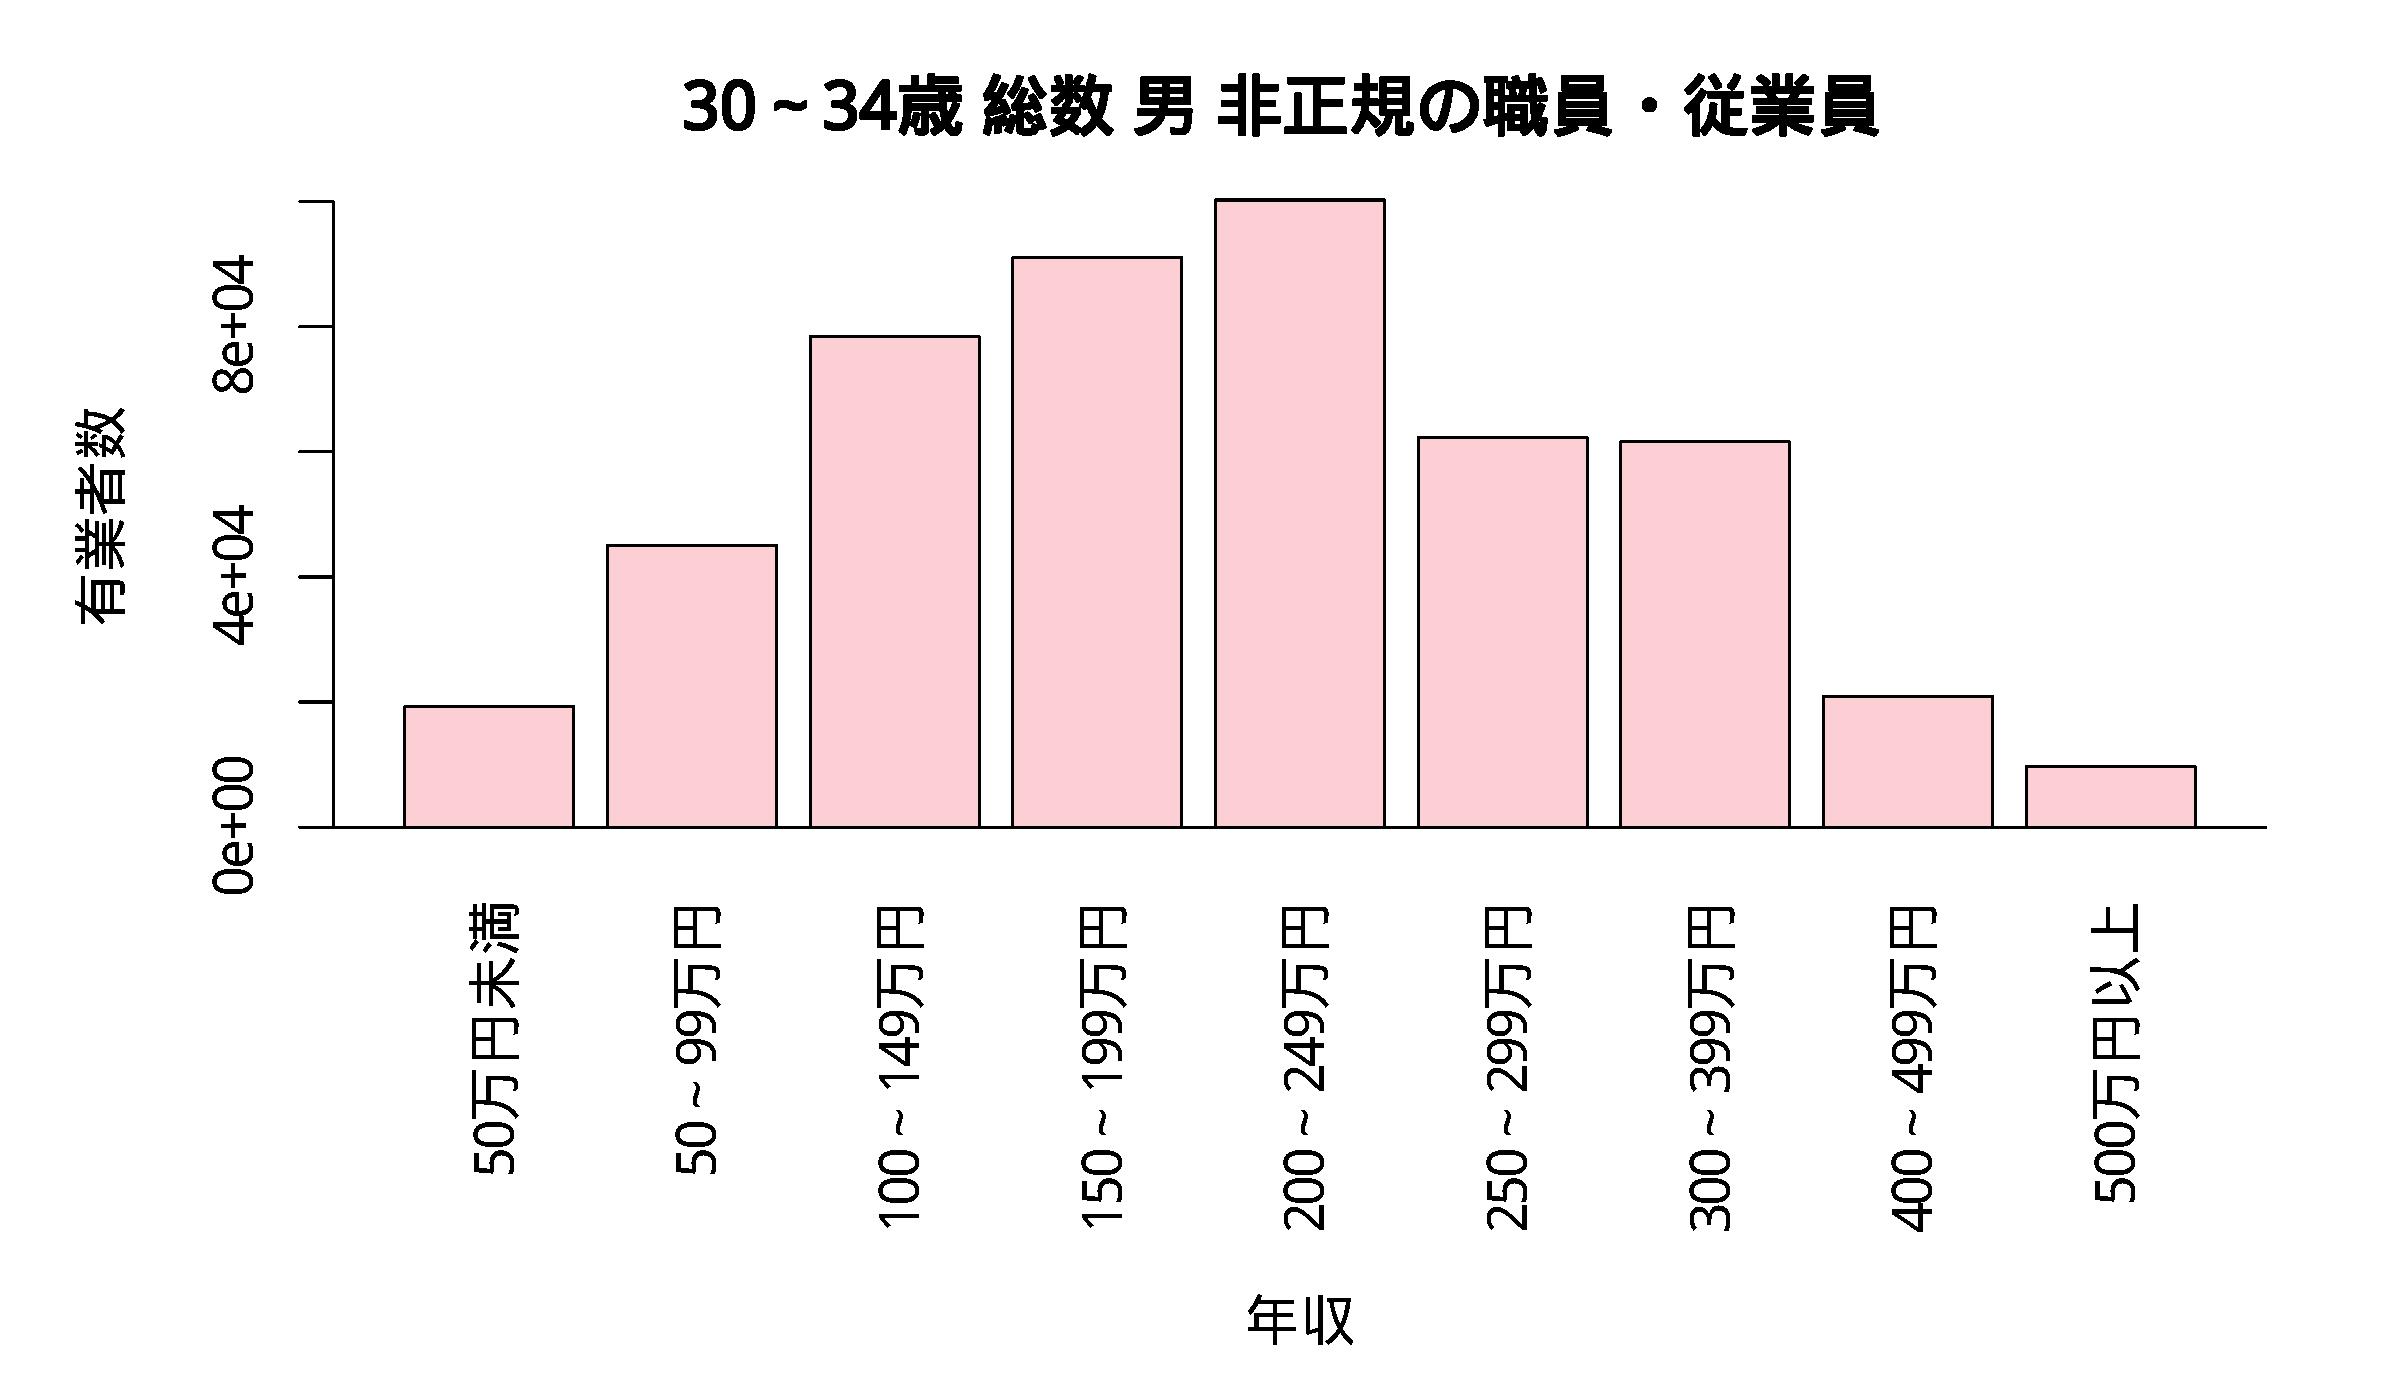 年収分布 30~34歳 総数 男 非正規の職員・従業員